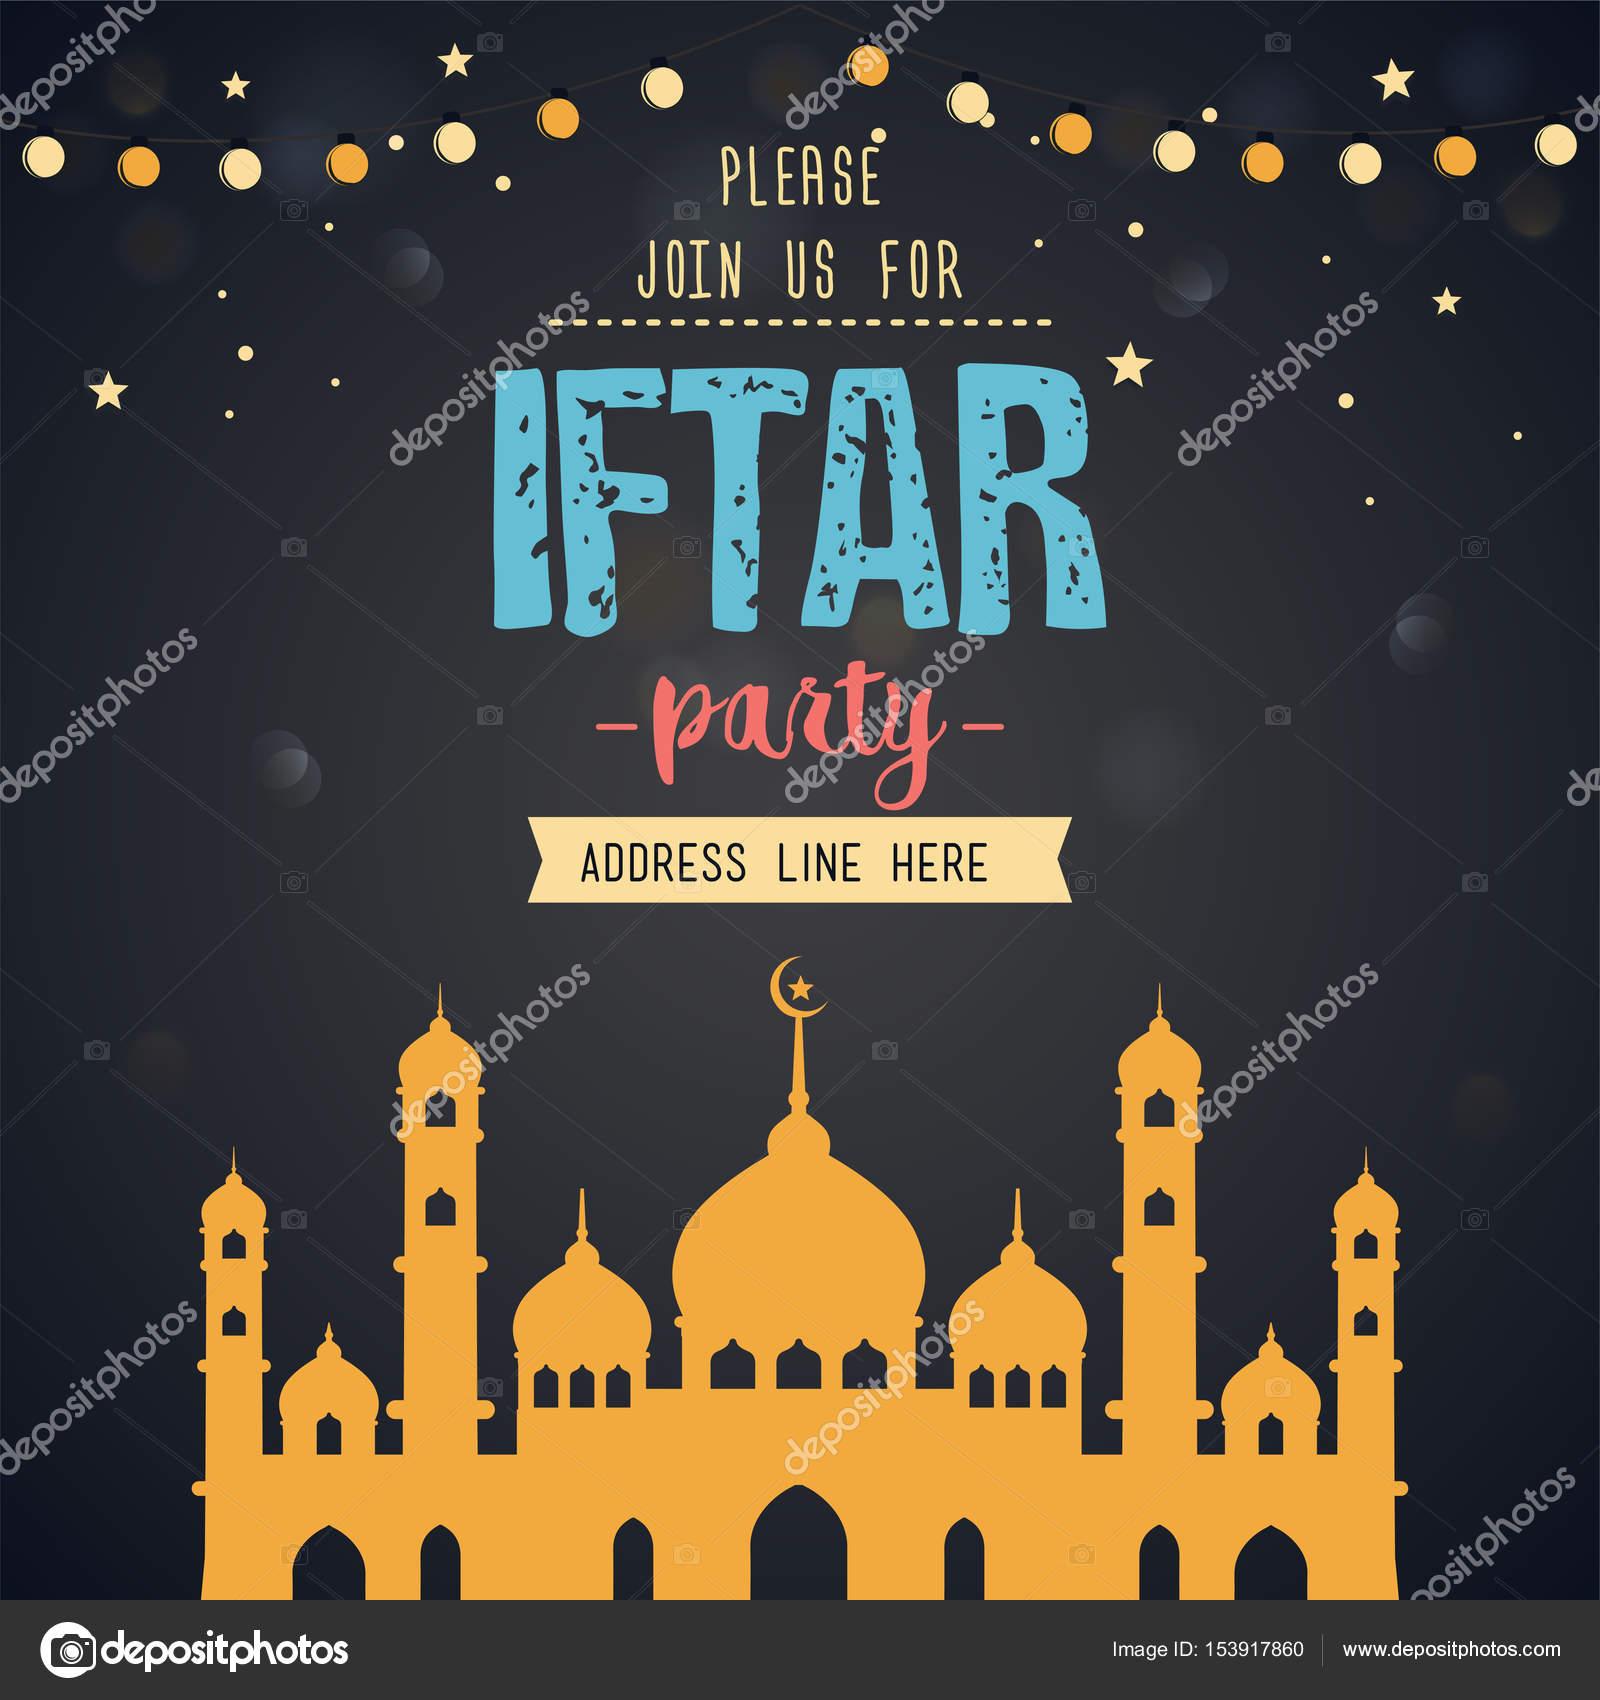 Ramadan kareem iftar party invitation card stock vector ekler ramadan kareem iftar party invitation card stock vector stopboris Image collections